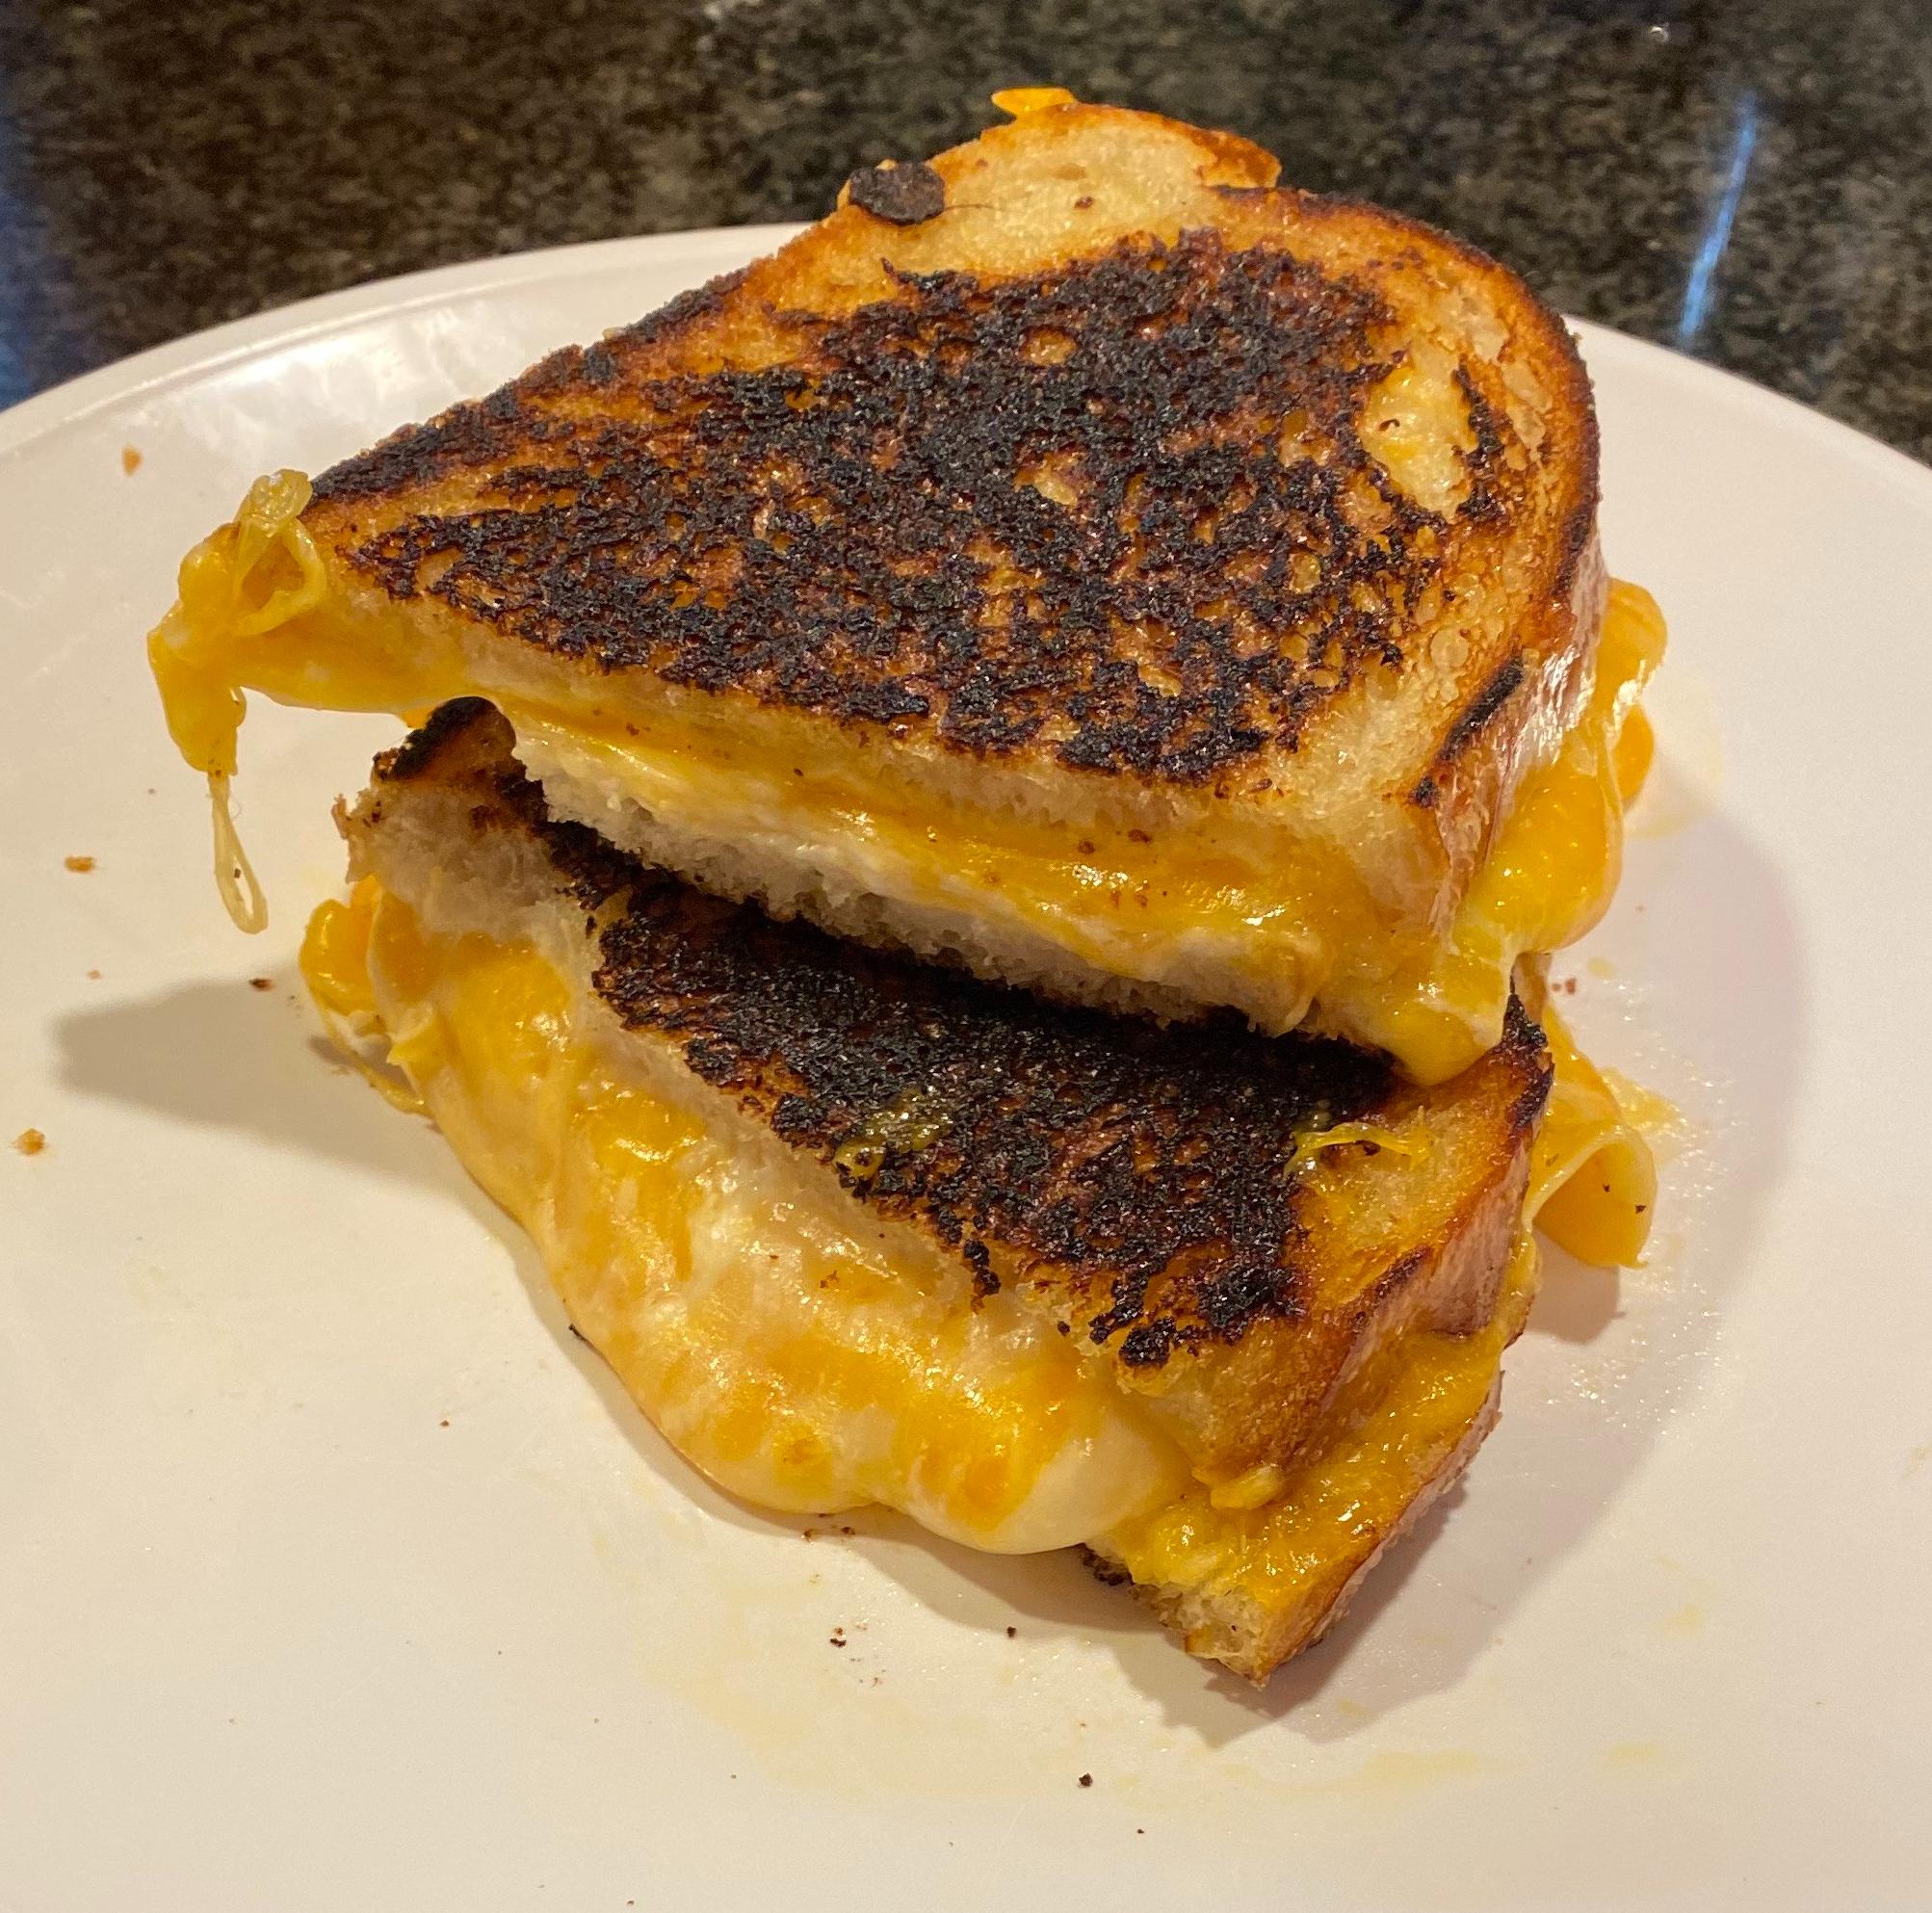 Disneyland's signature grilled cheese sandwich